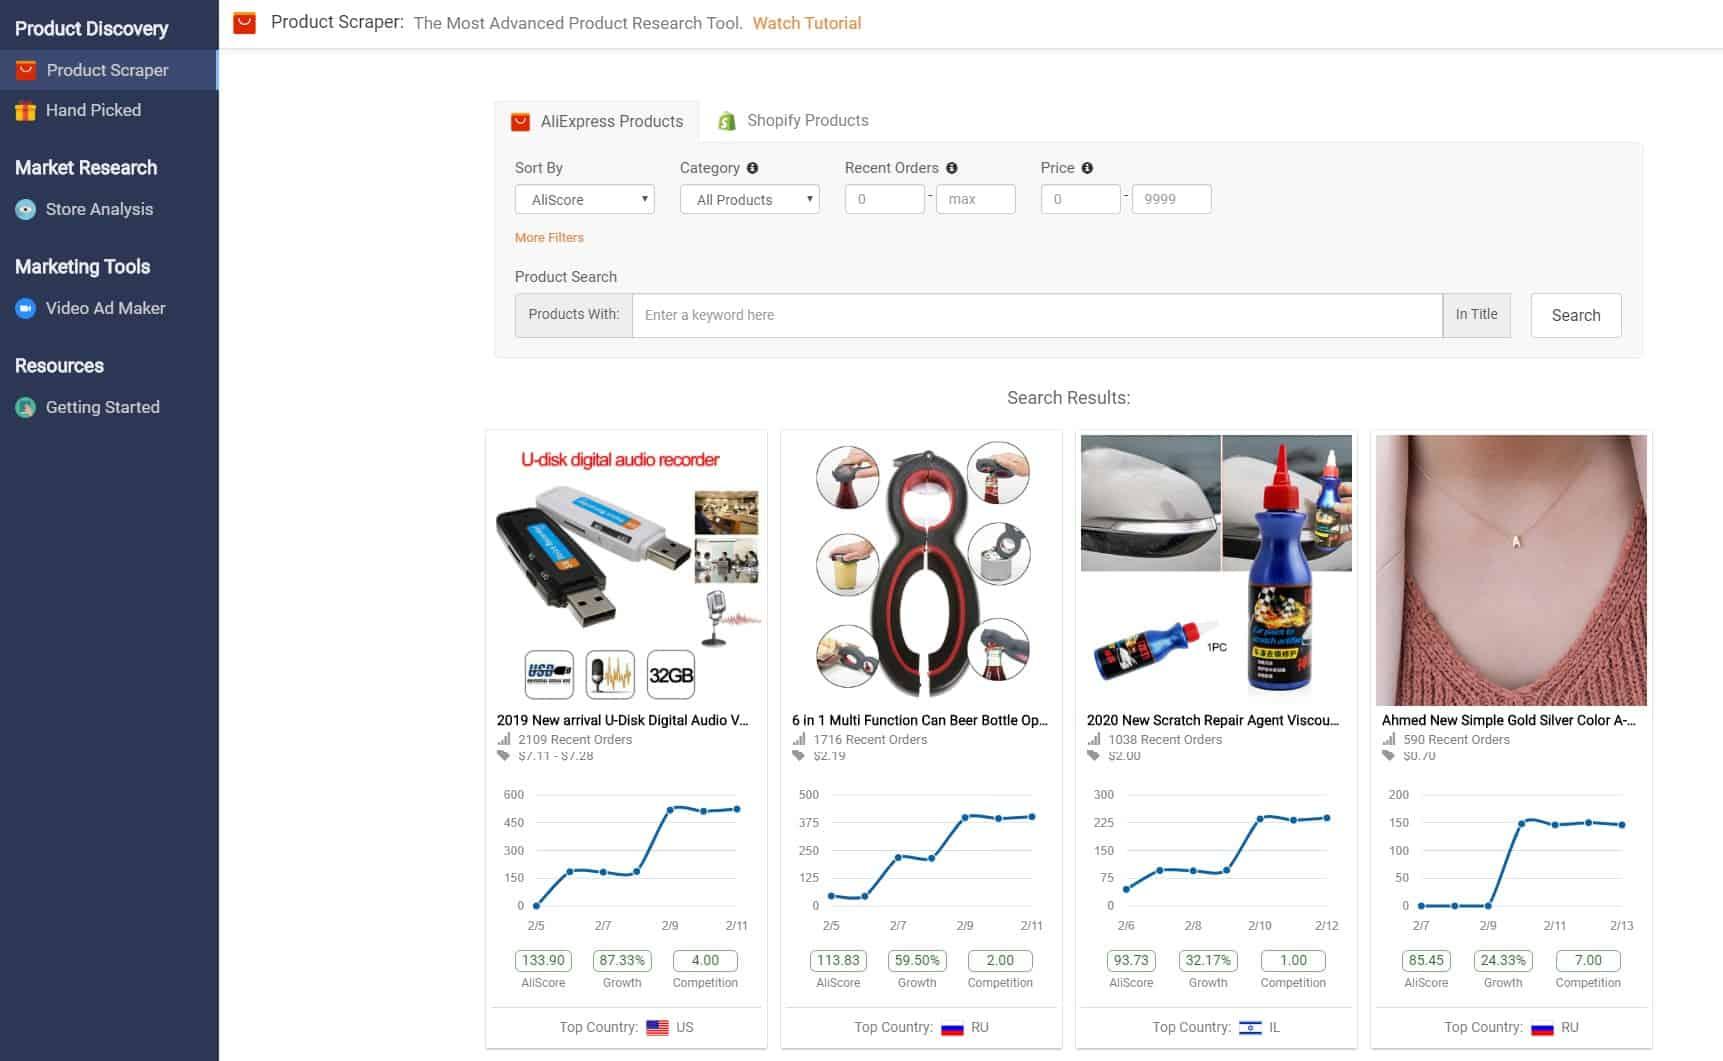 Niche Scraper Review: Product research tools | The Product Scraper